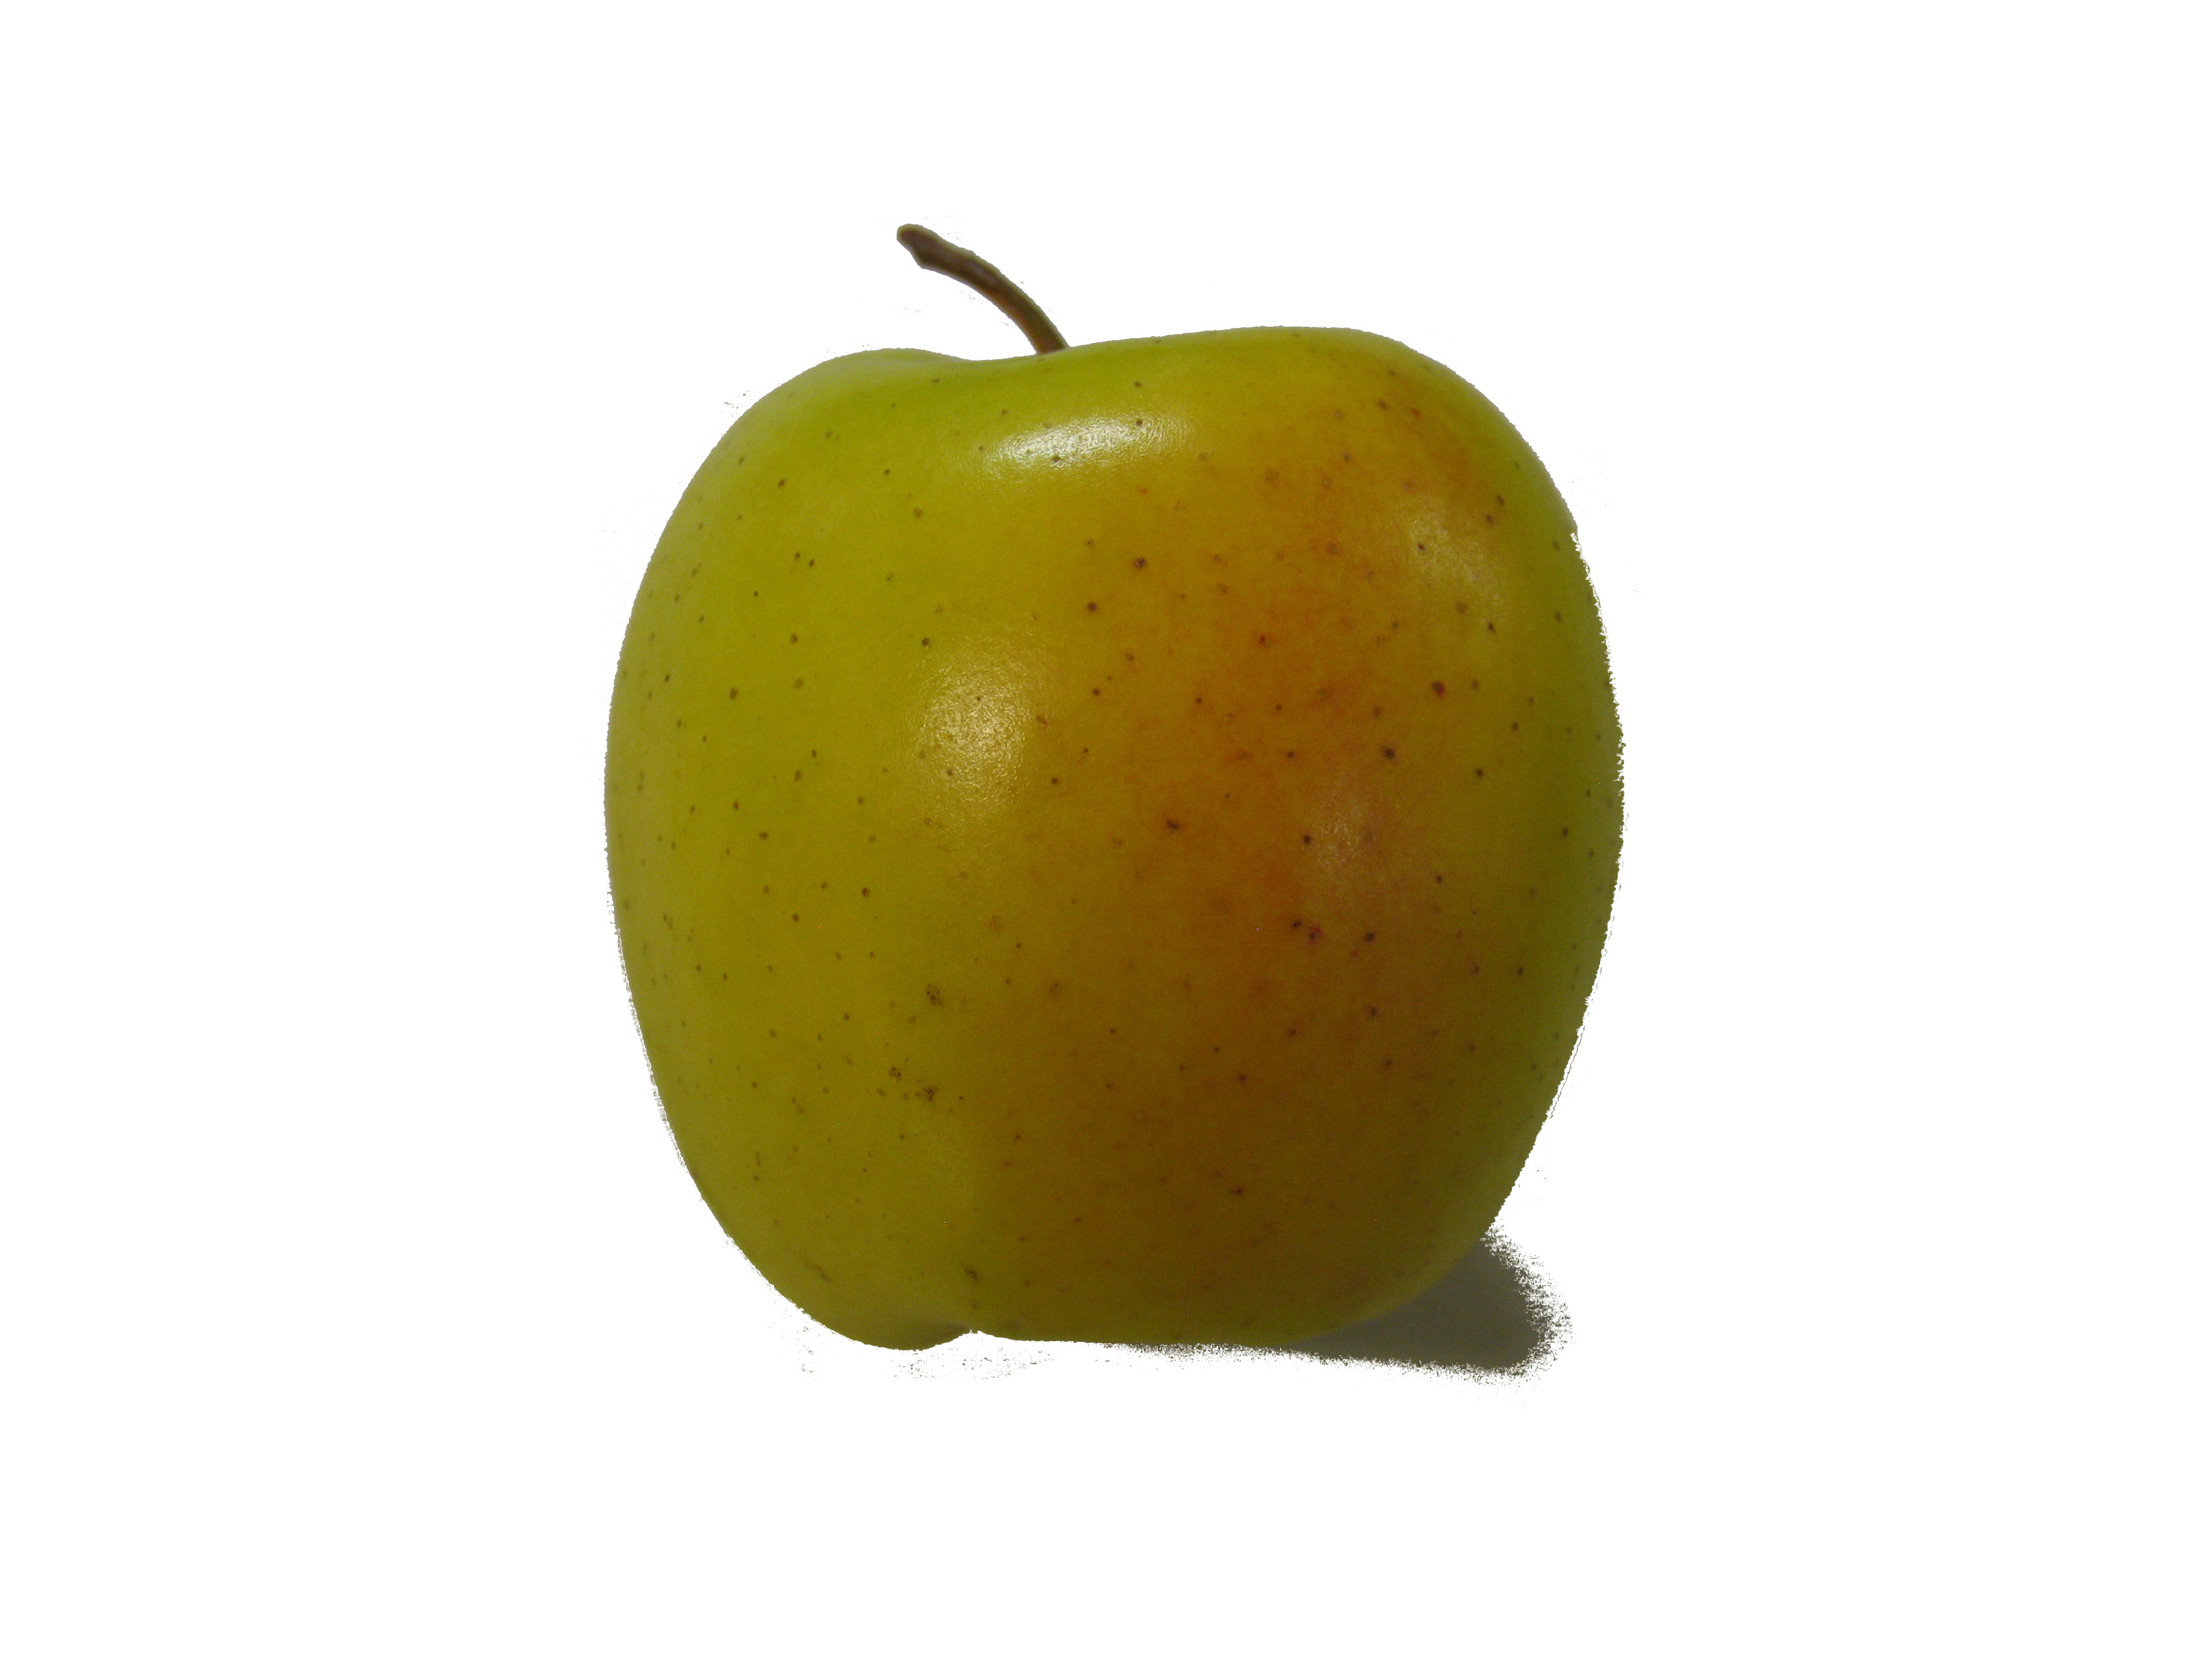 apfel golden delicious melon